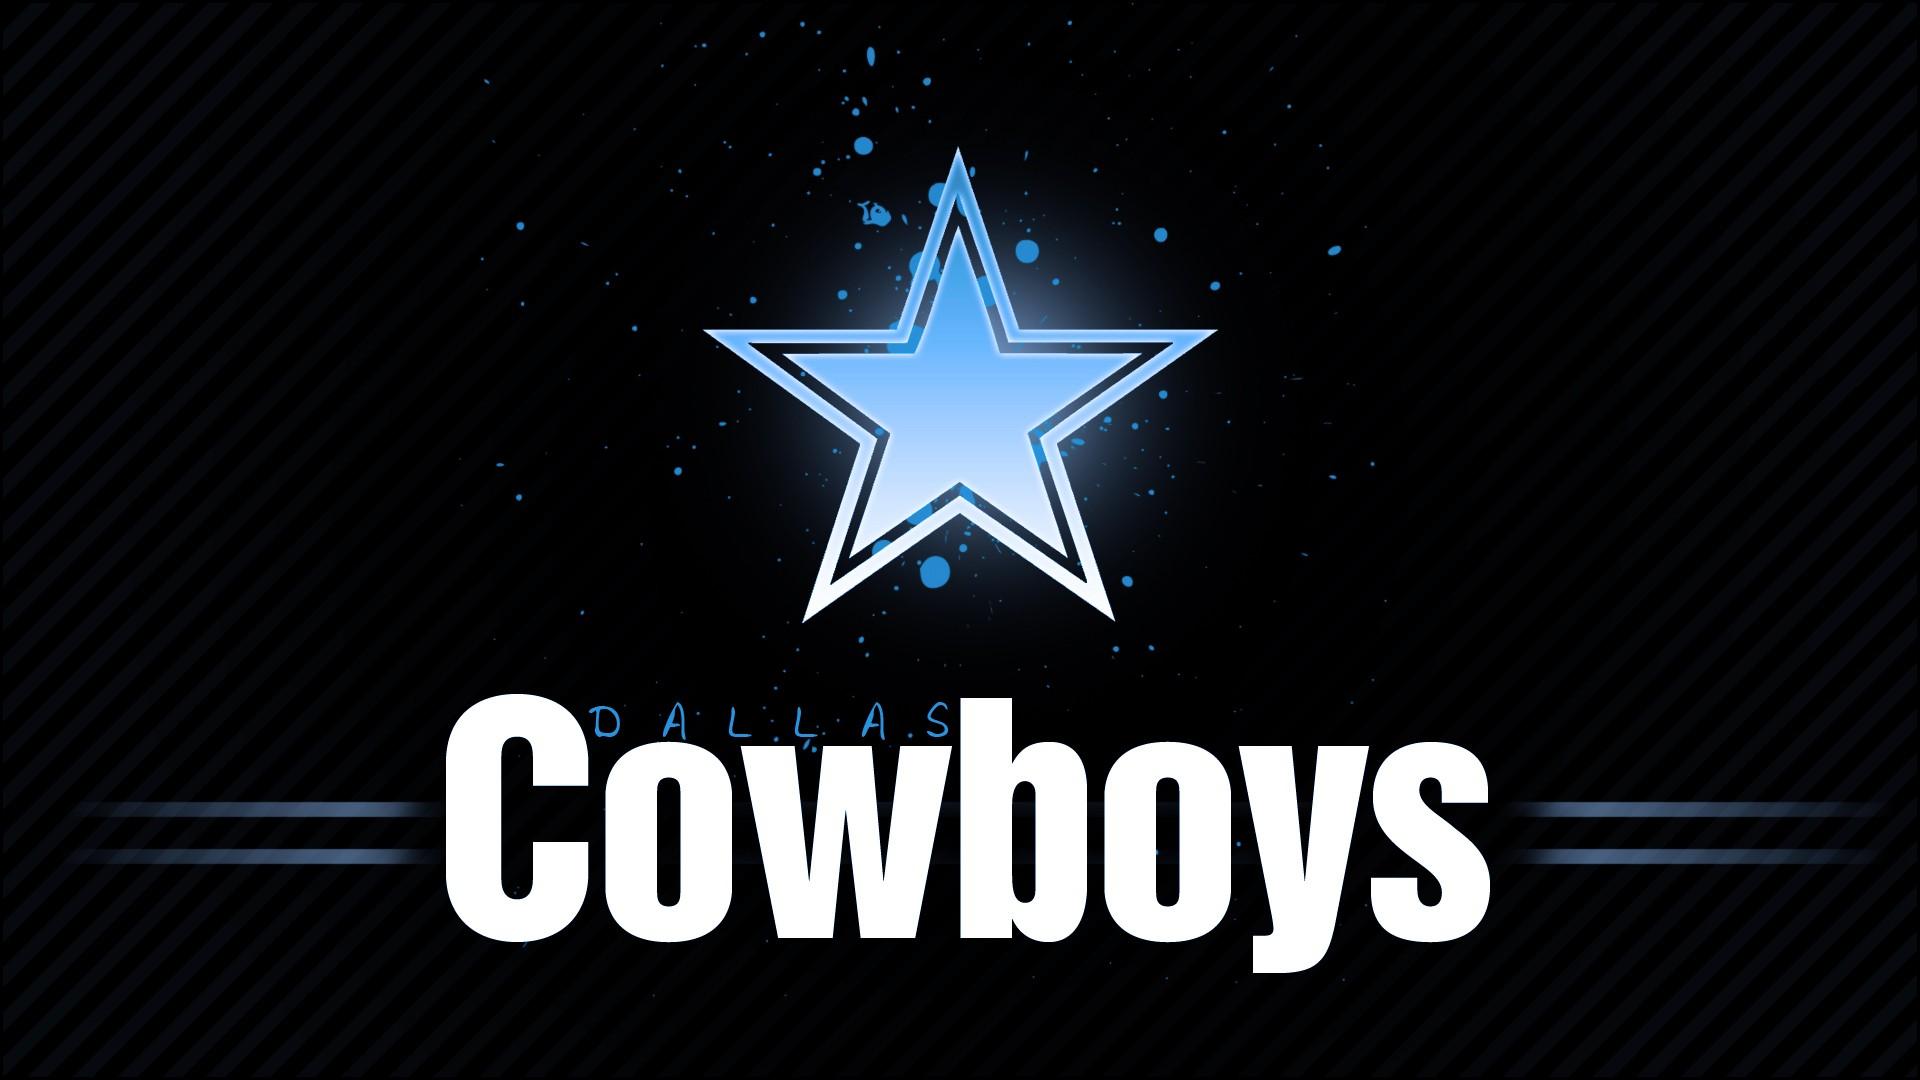 Dallas Cowboys Wallpaper Meizu   Src Dallas Cowboys - Dallas Cowboys Wallpaper Hd - HD Wallpaper